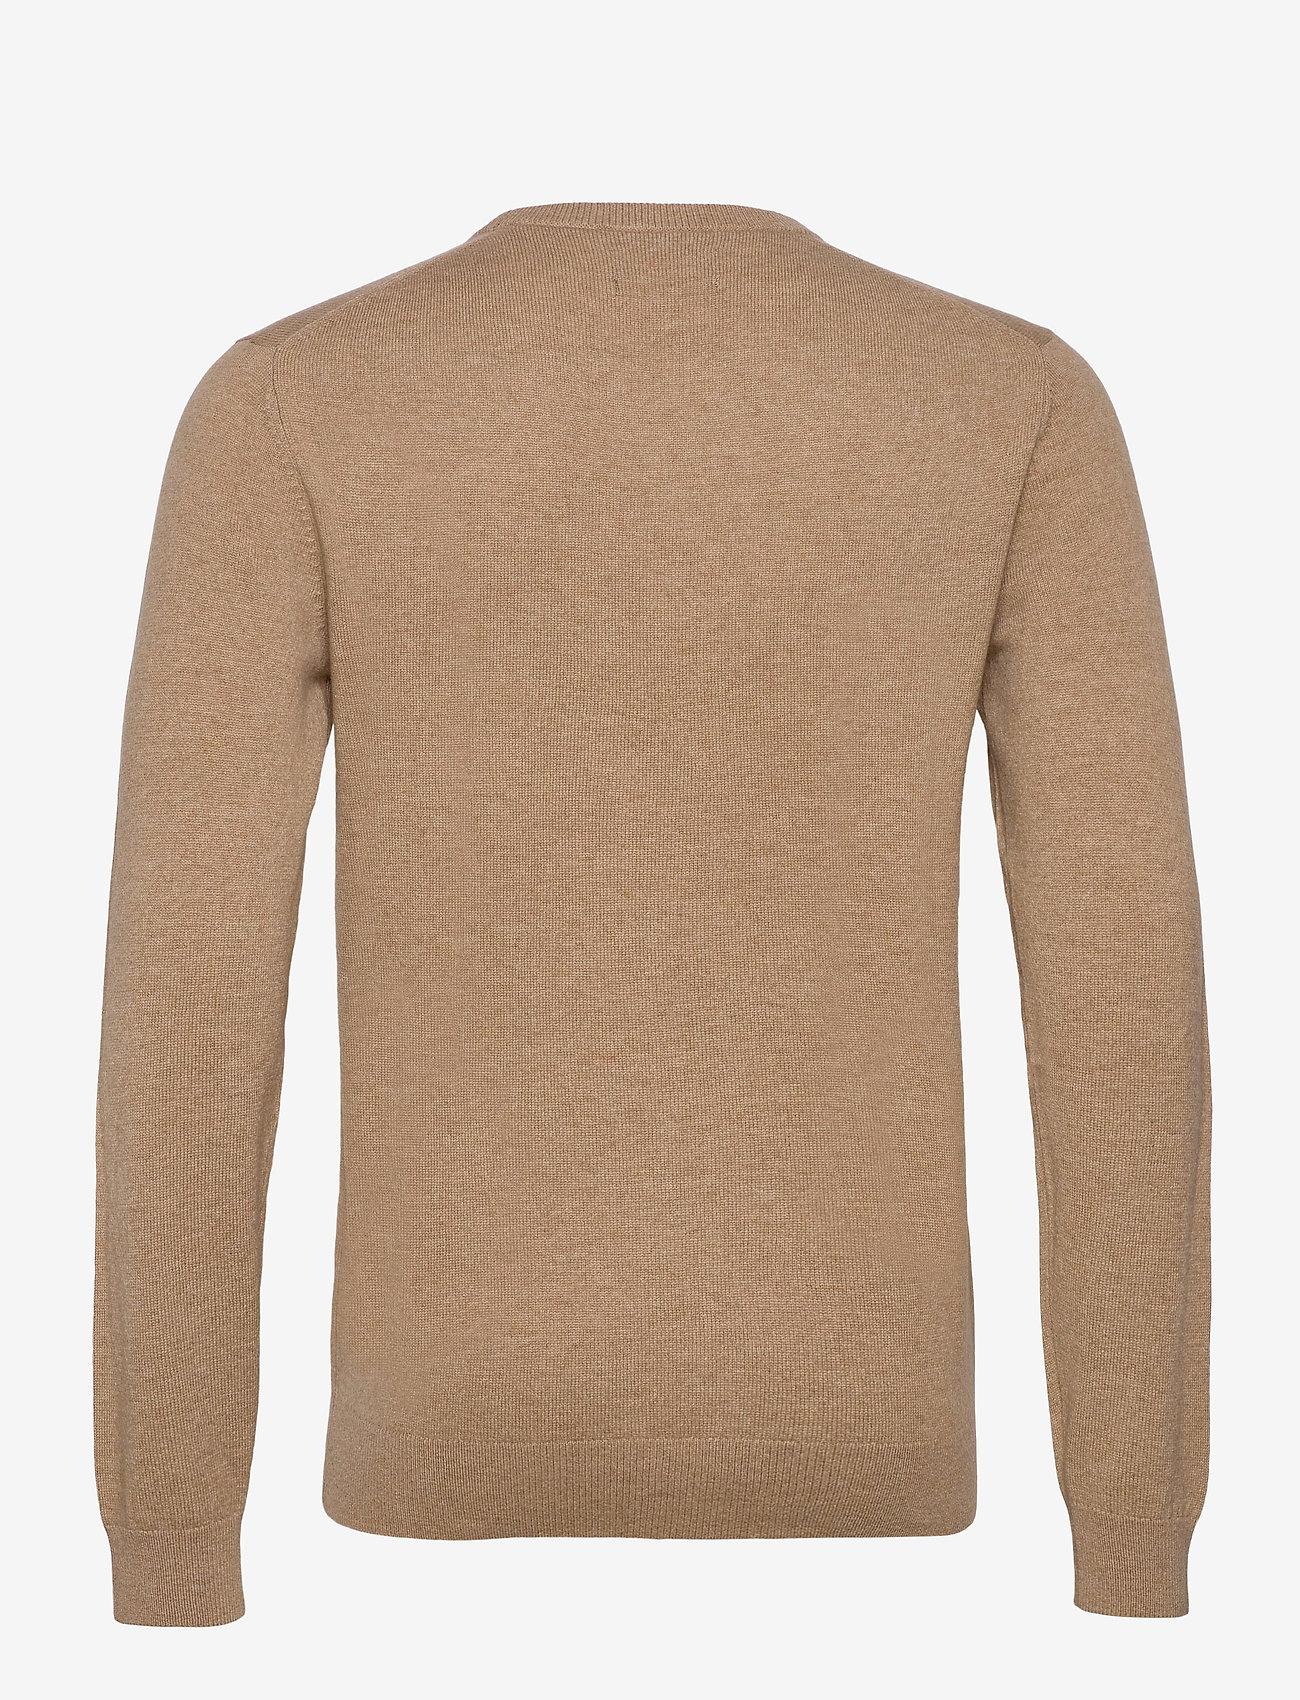 GANT - D1. WOOL CASHMERE  C-NECK - basic knitwear - warm khaki - 1